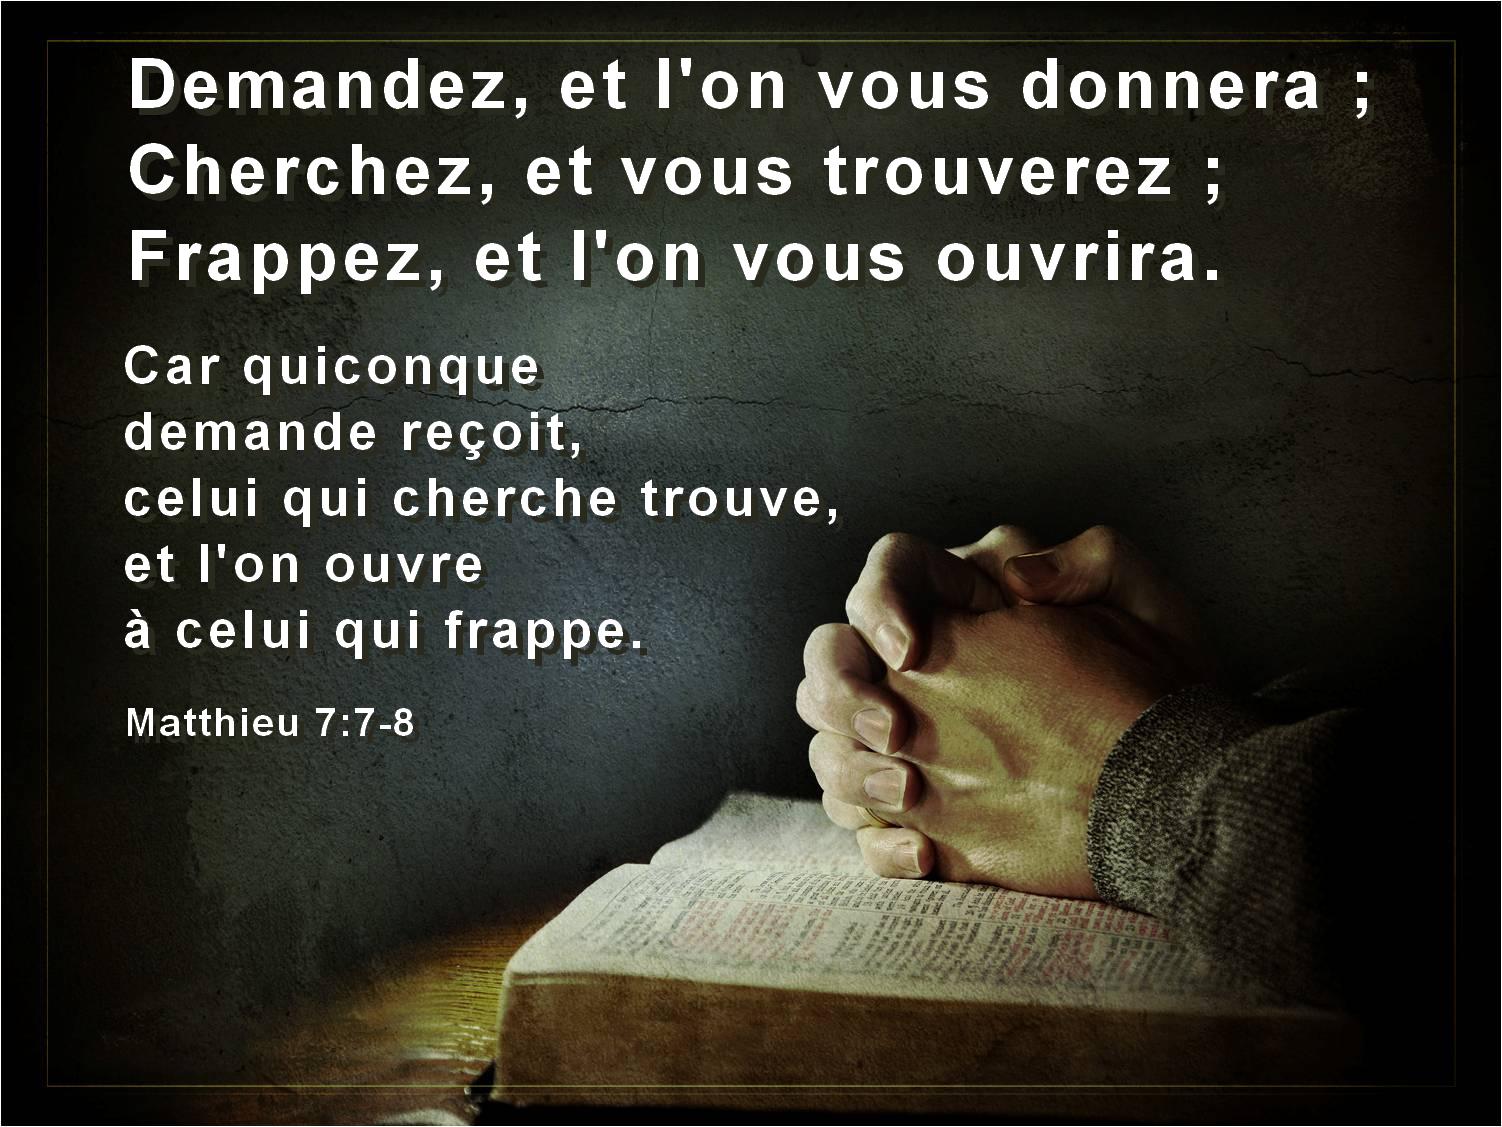 Pin by MafuVaï MUA on Versets de la Bible